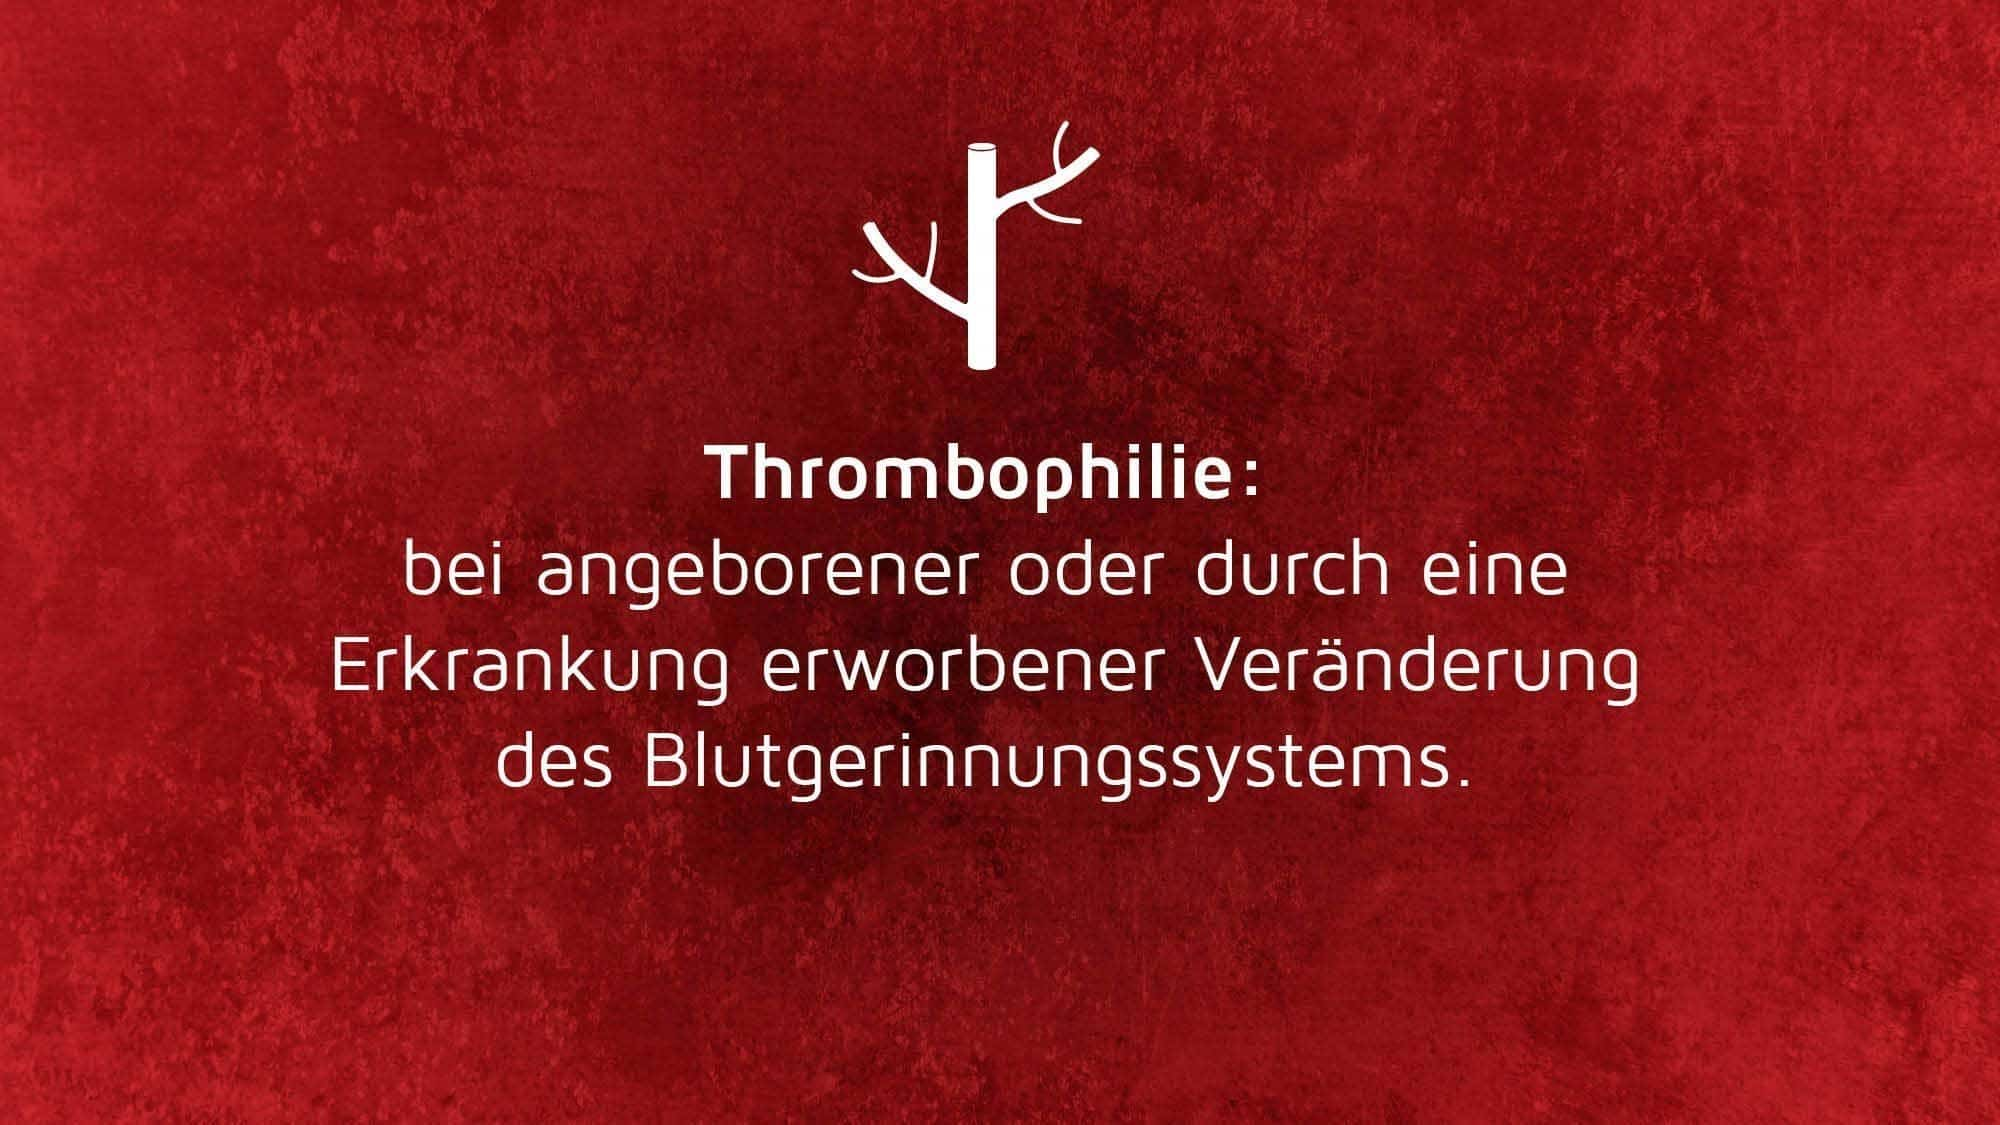 Risikofaktoren Thrombose: Thrombophilie